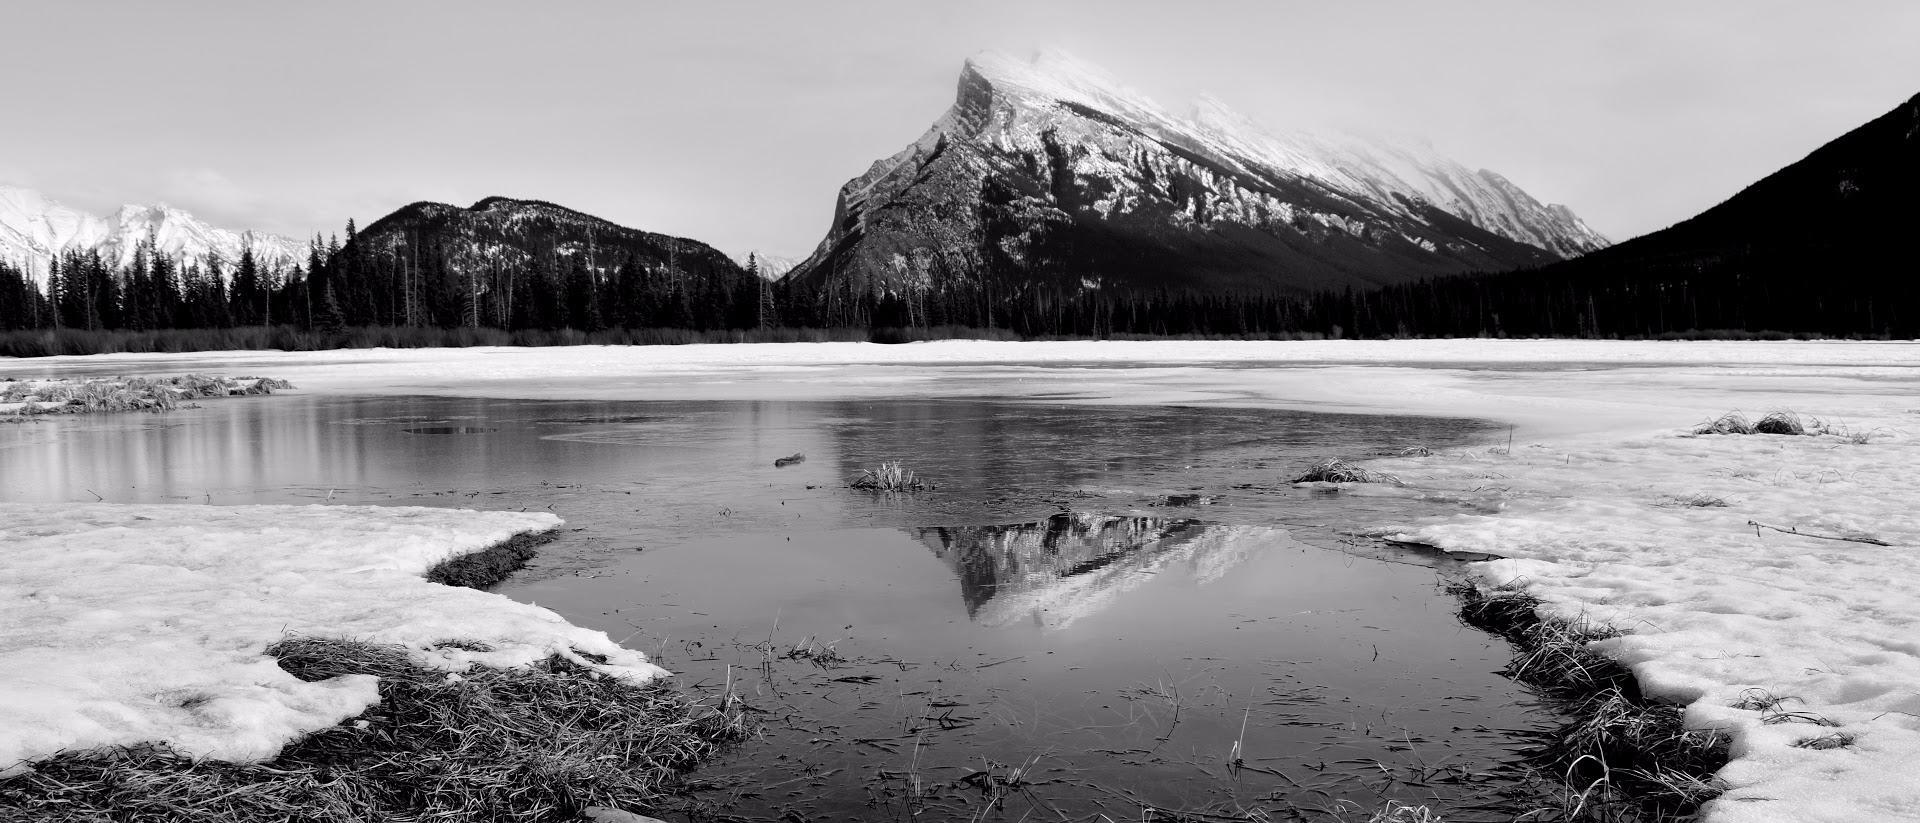 Reflections warm days melt ice  - camwmclean | ello